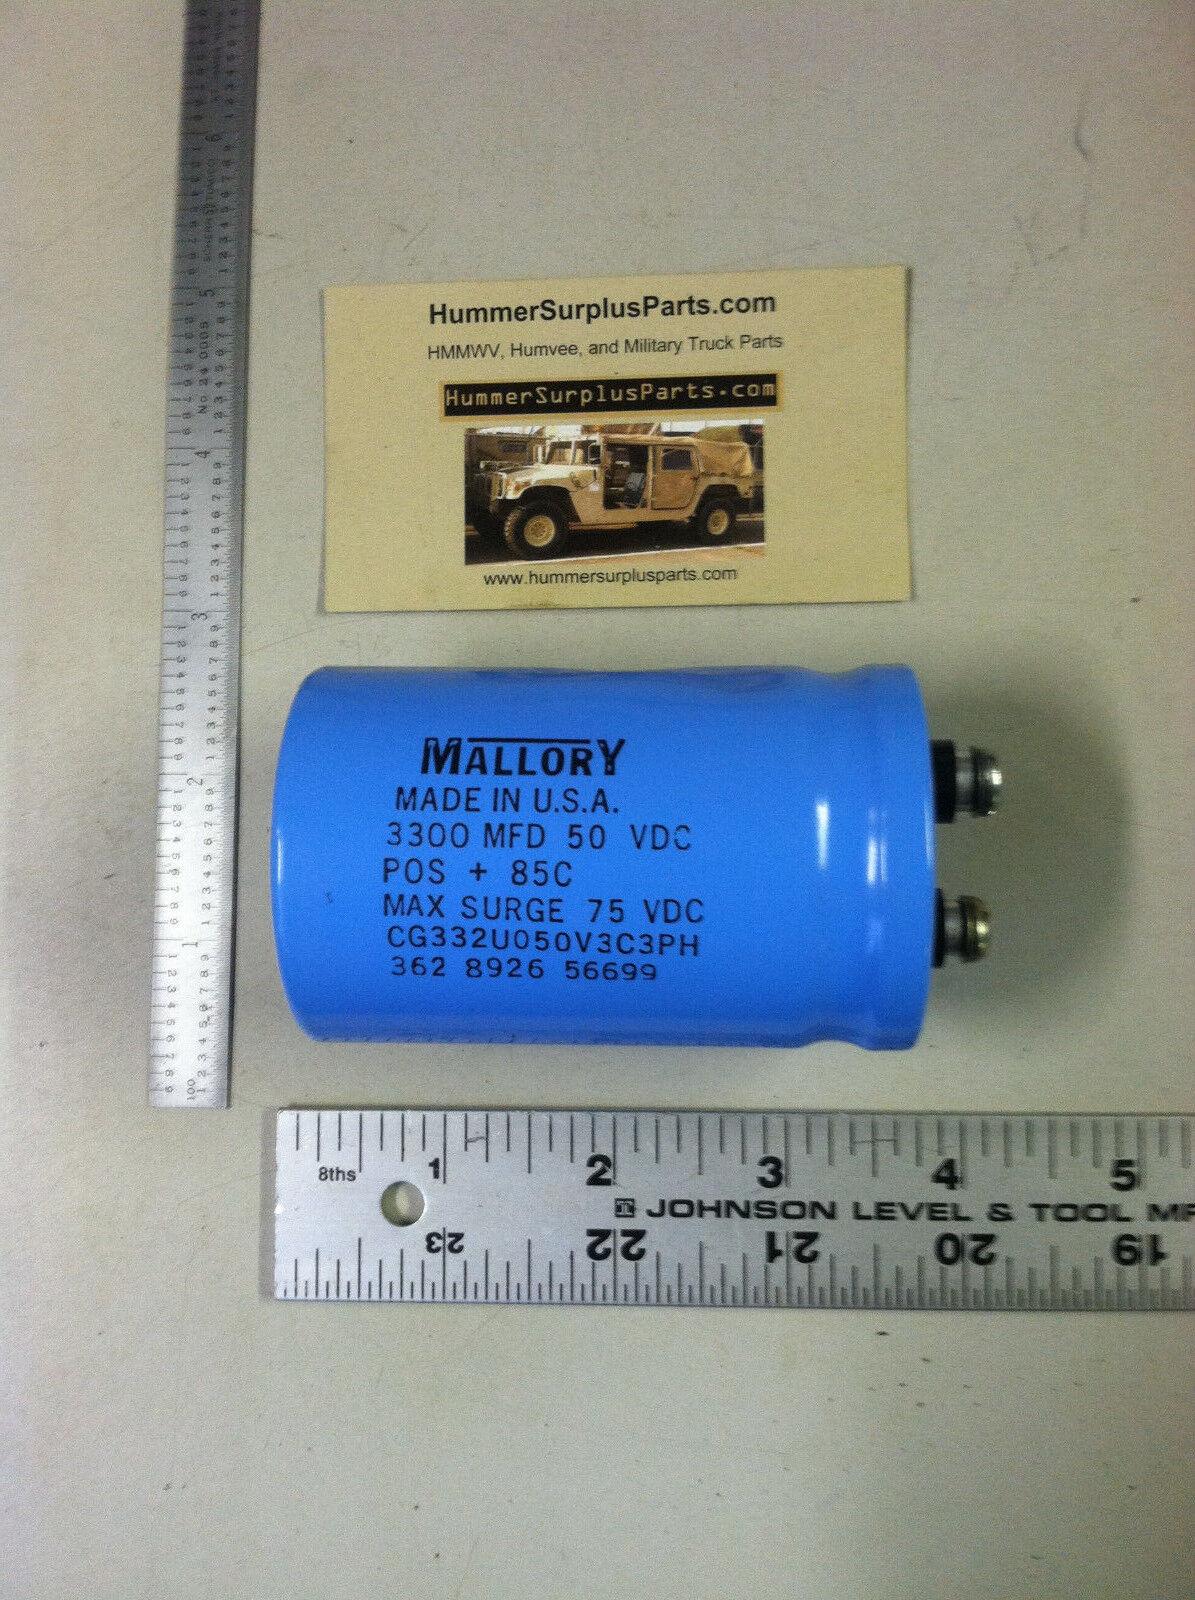 9400MFD 50VDC Aluminum Electrolytic Capacitor Screw Terminal Aerovox Mallory USA